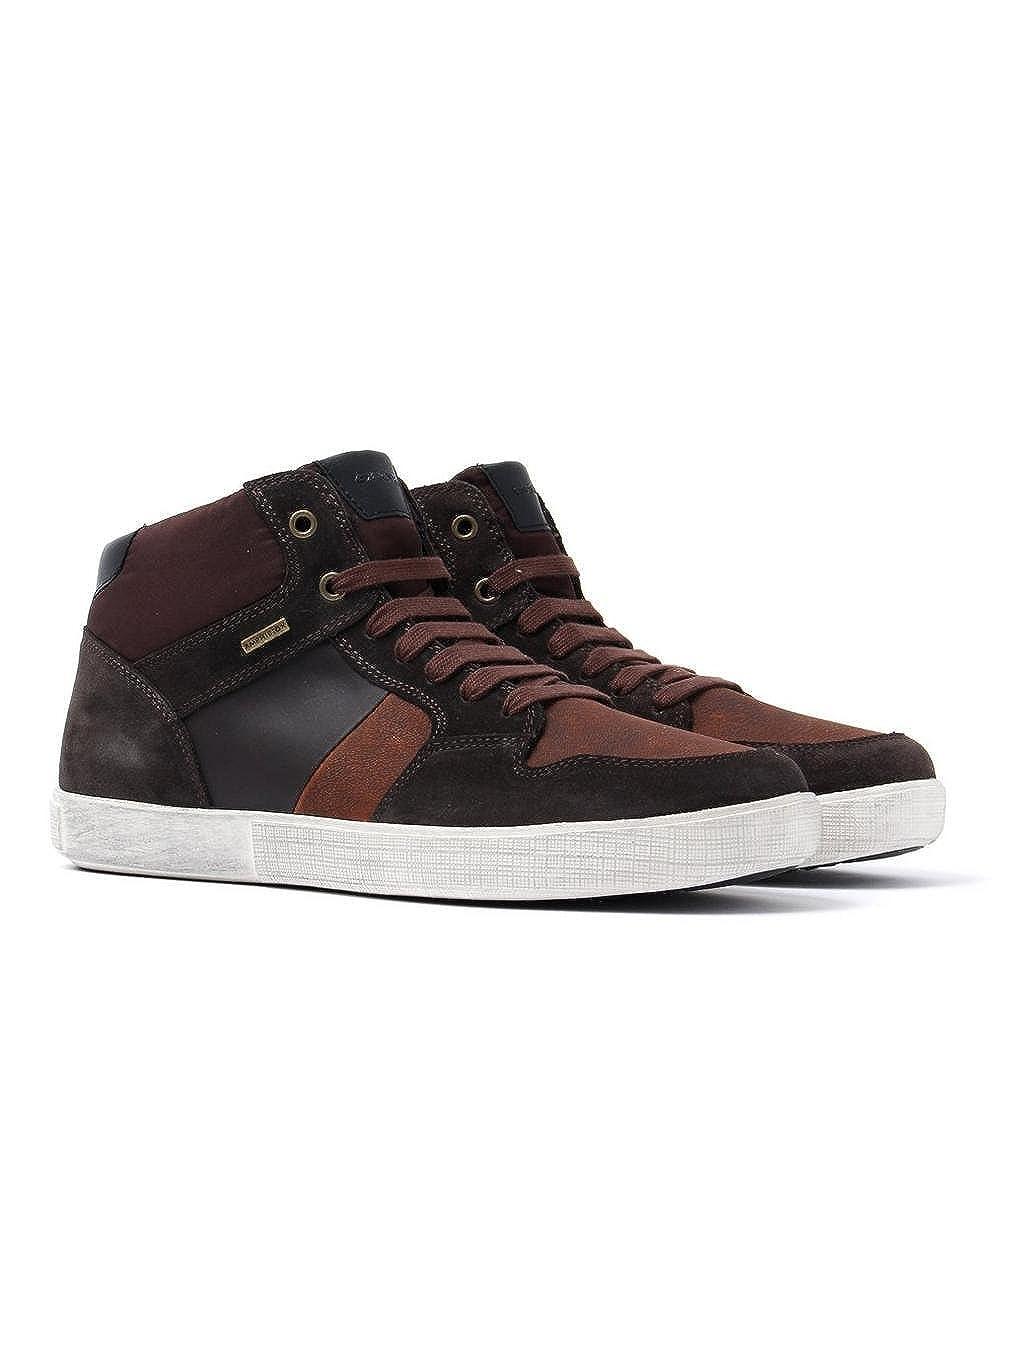 TALLA 44 EU. Zapato GEOX U741UA 020FU C61T7J Marron